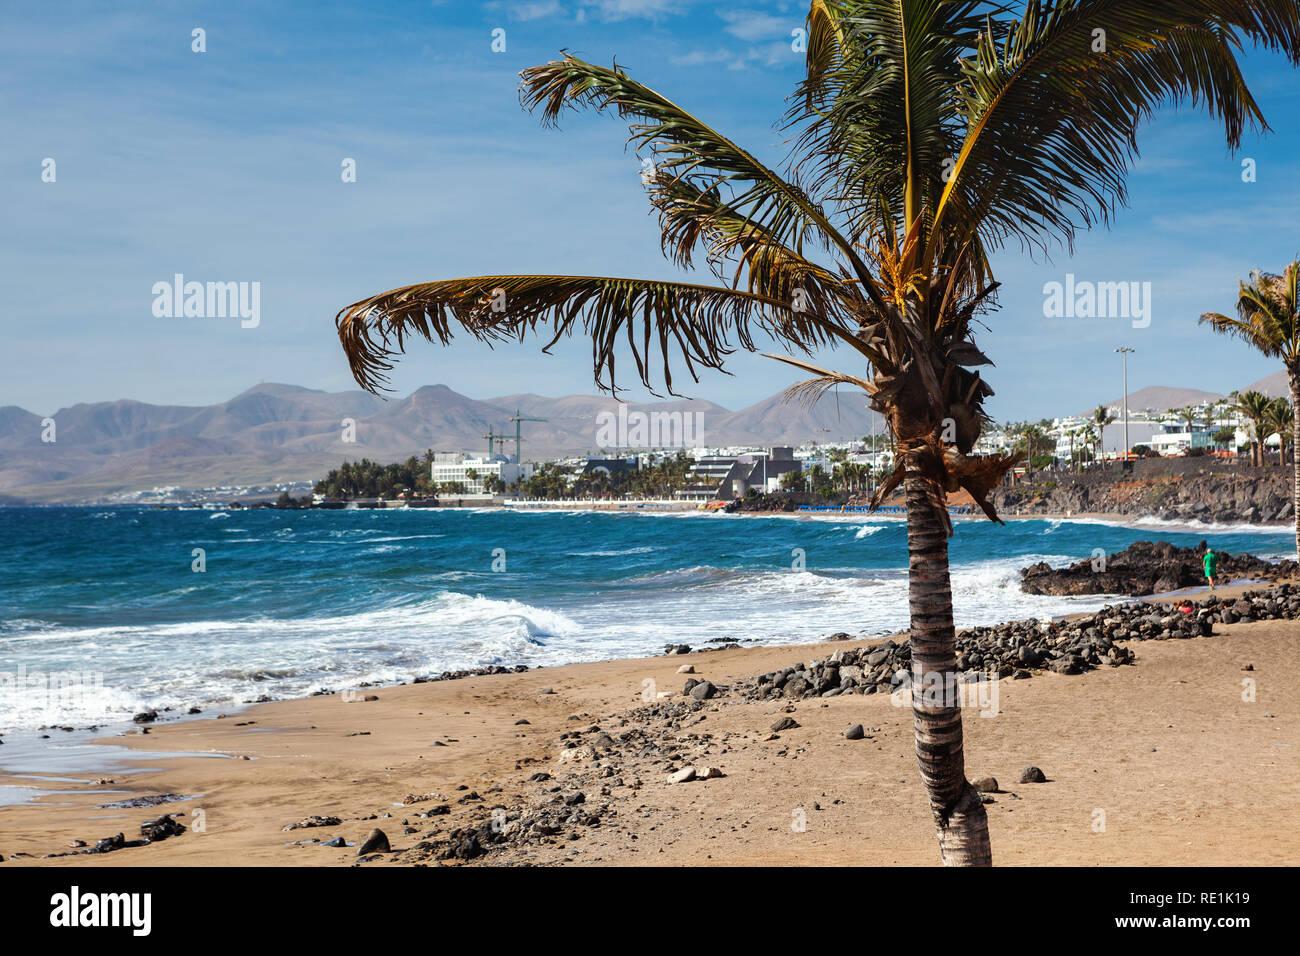 Puerto del Carmen beach in Lanzarote, Canary islands, Spain. blue sea, palm trees, selective focus Stock Photo